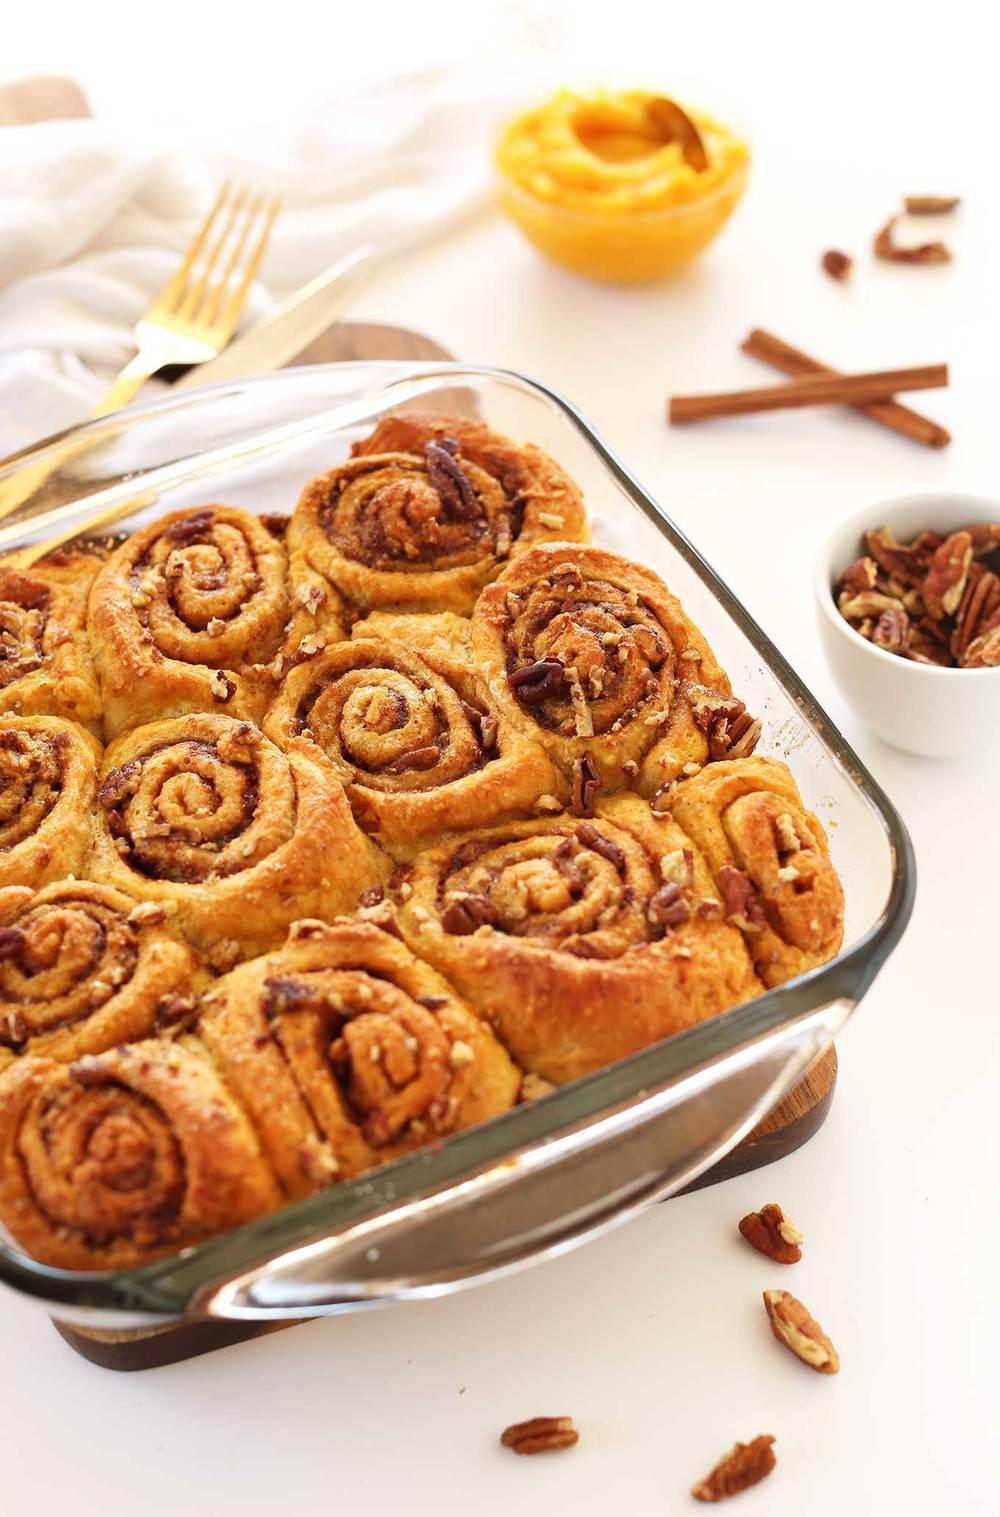 AMAZING-1-bowl-Vegan-Pumpkin-Cinnamon-Rolls-Simple-perfectly-spiced-so-delicious.jpg